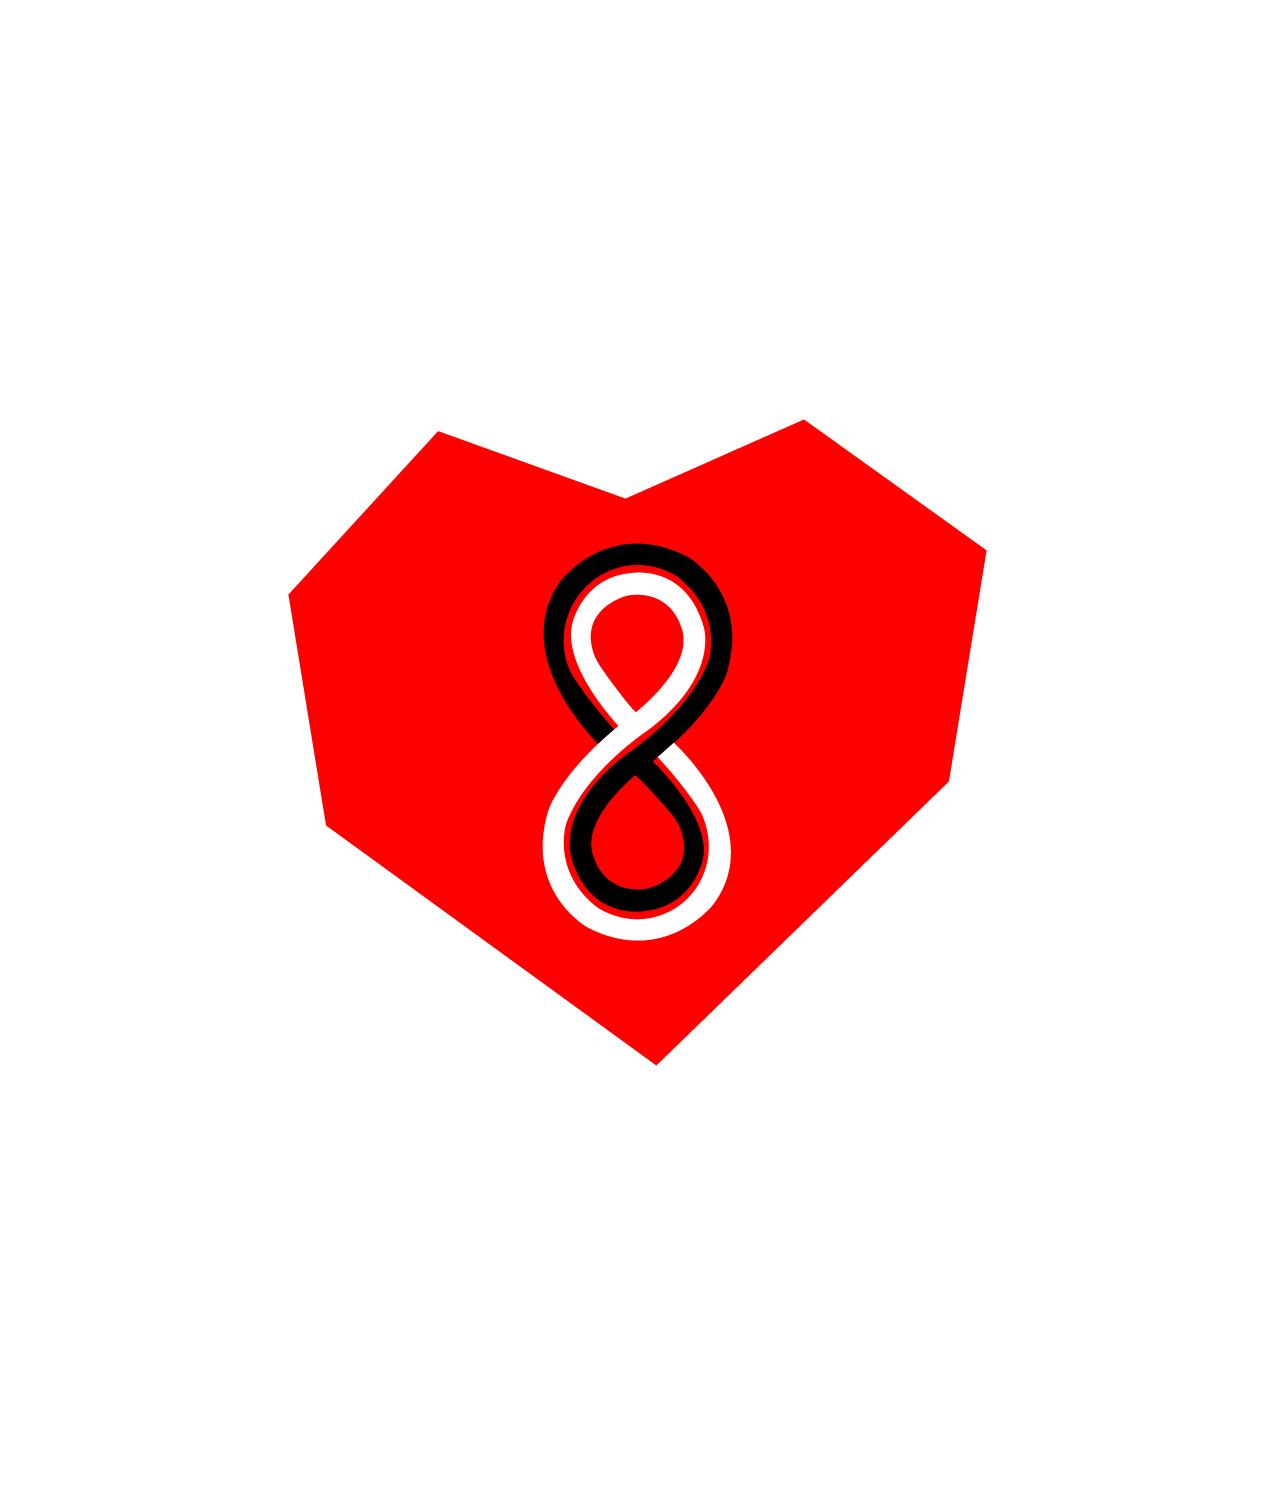 heart_logo_sticker.jpg